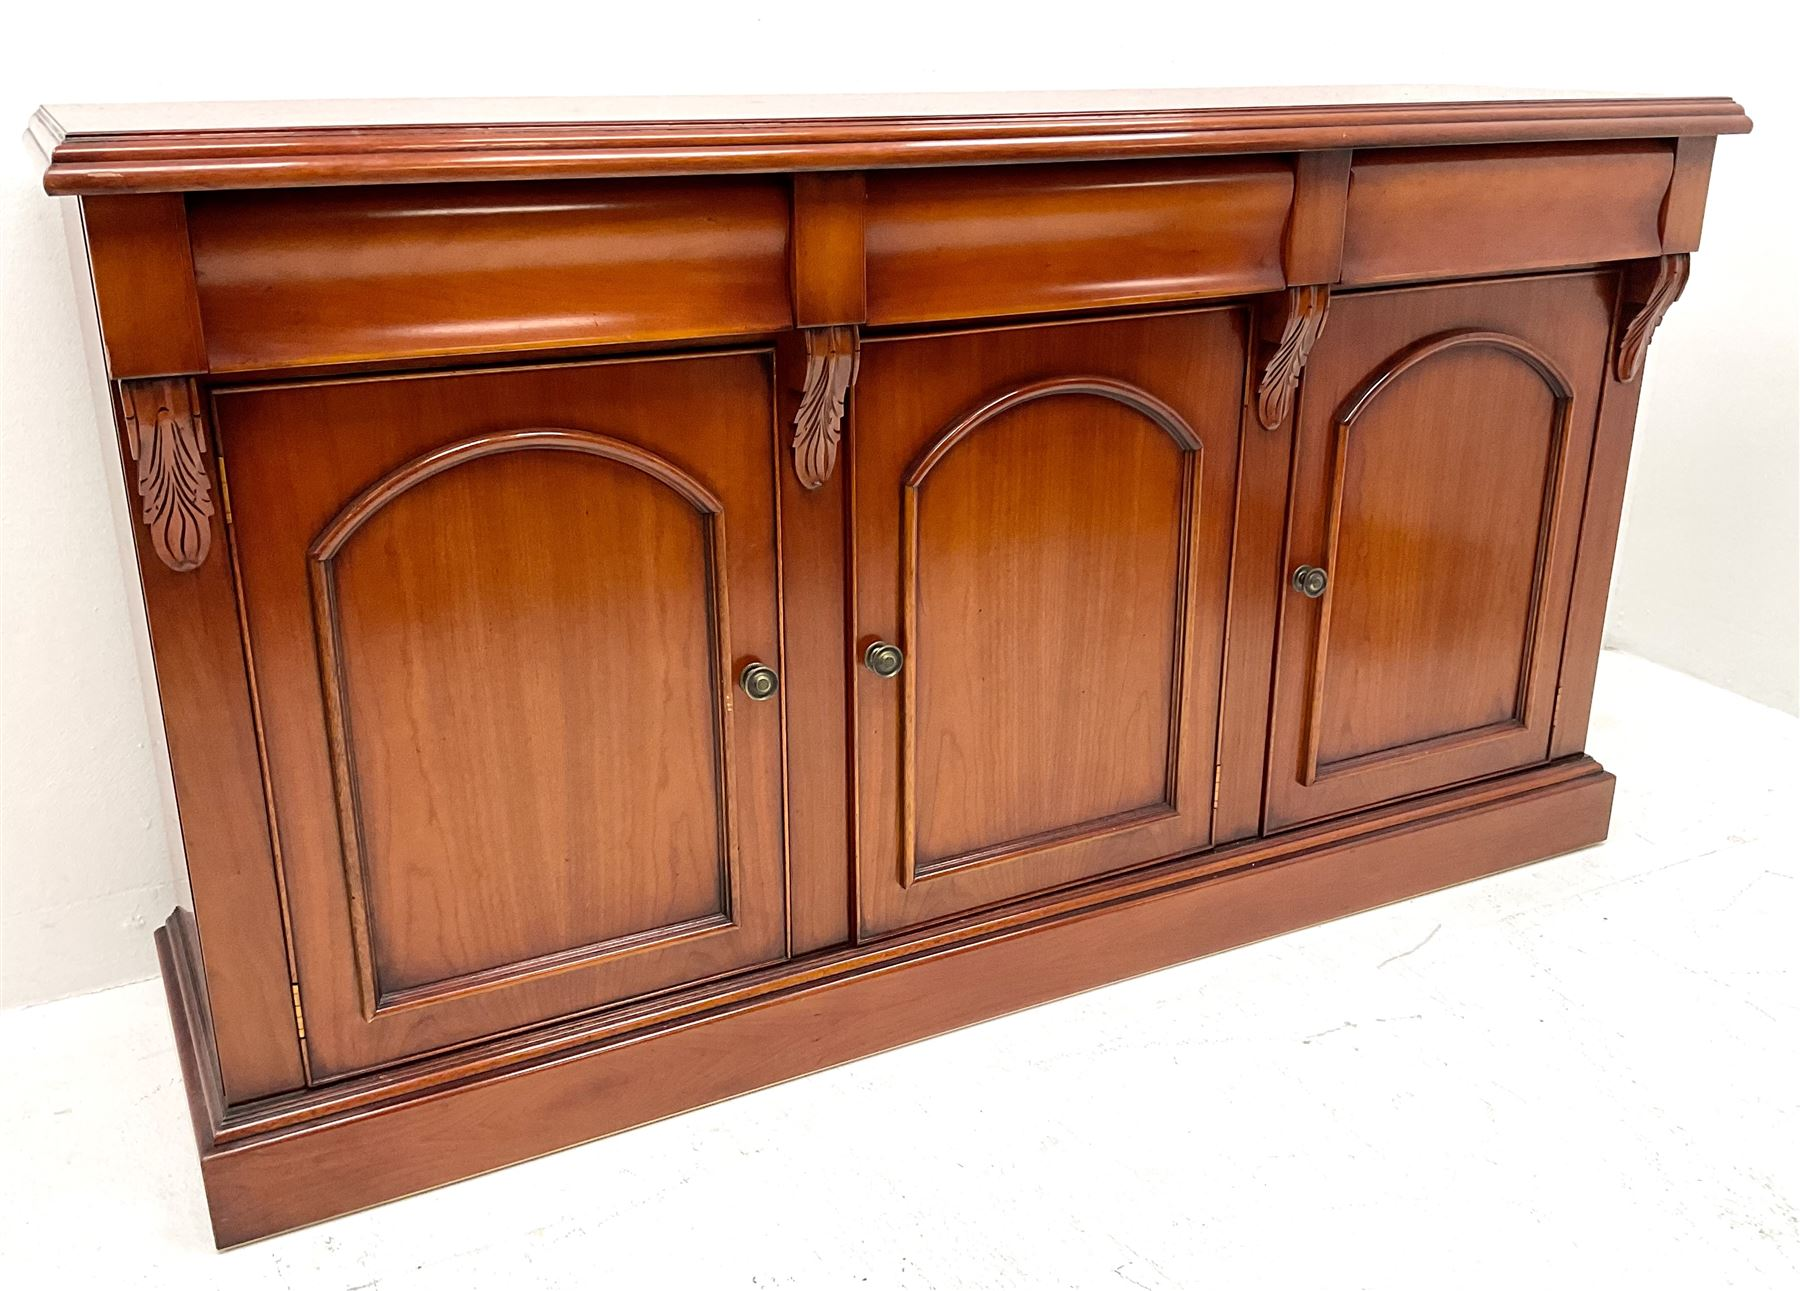 Waring & Gillow - cherry wood sideboard